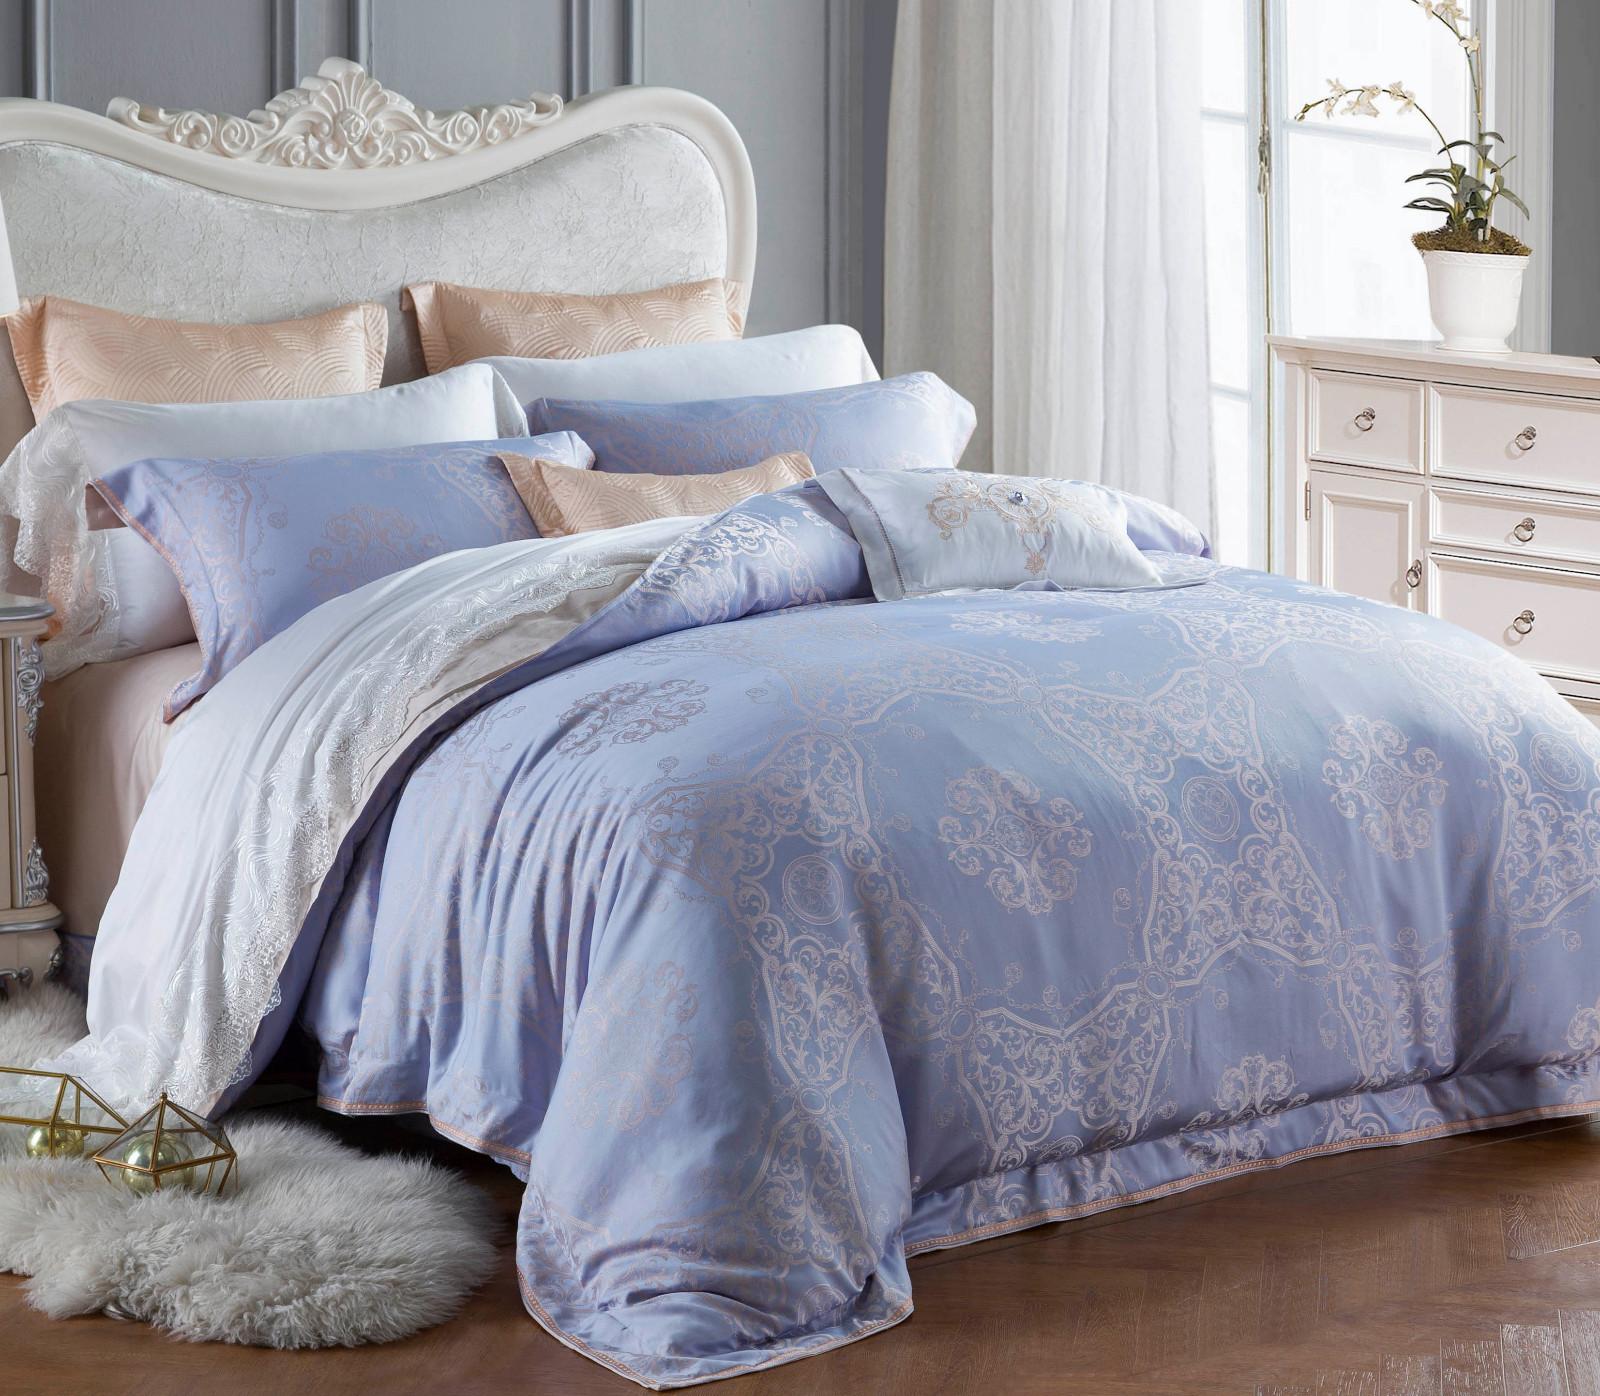 luxury stunning Daphne Brand jacquard duvet cover king